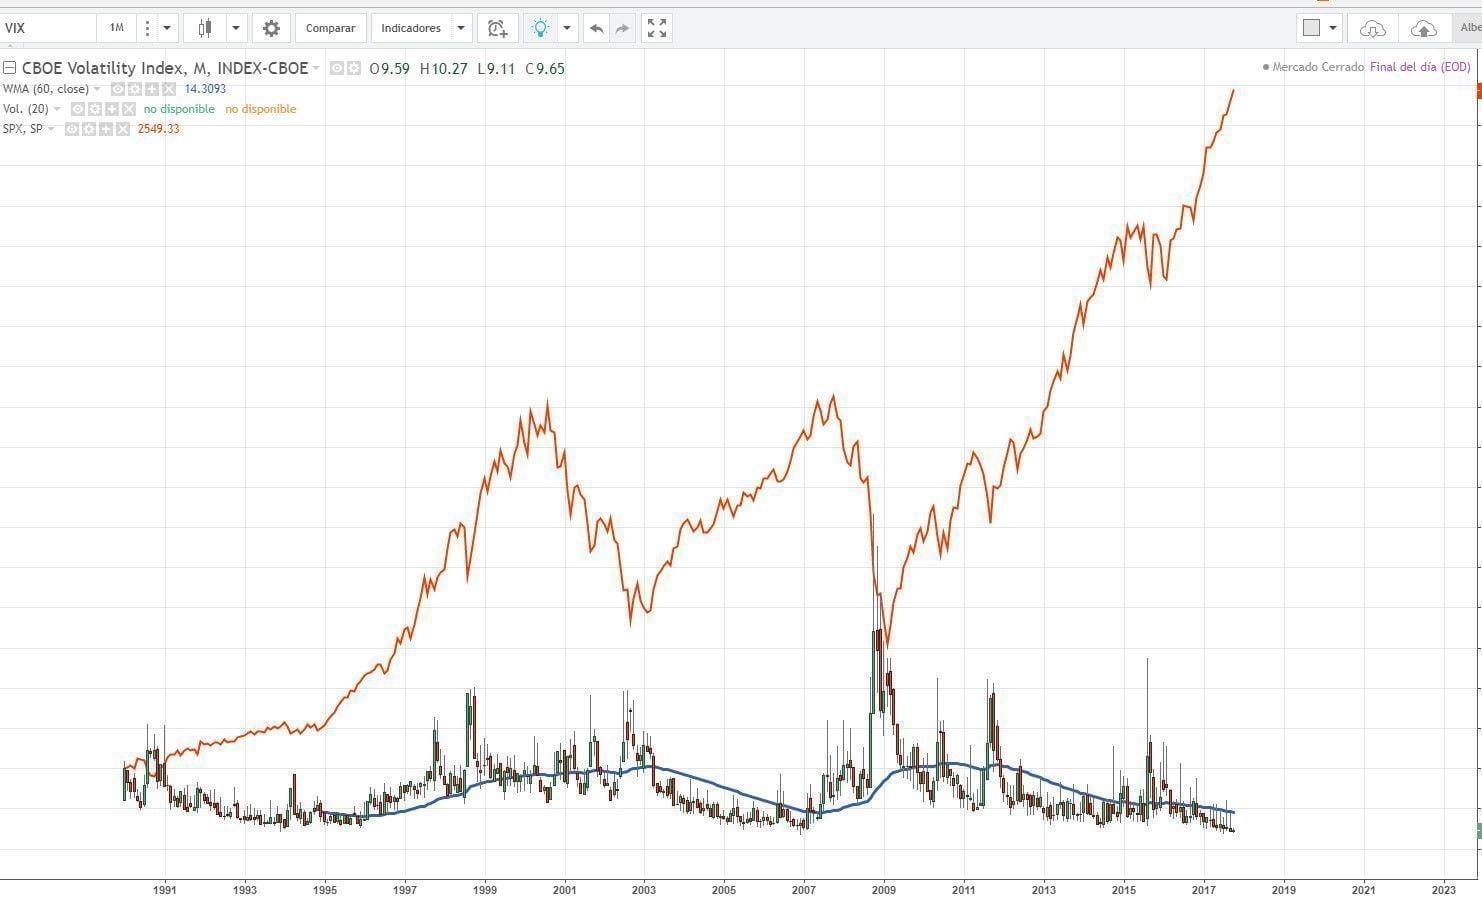 Histórico del índice VIX